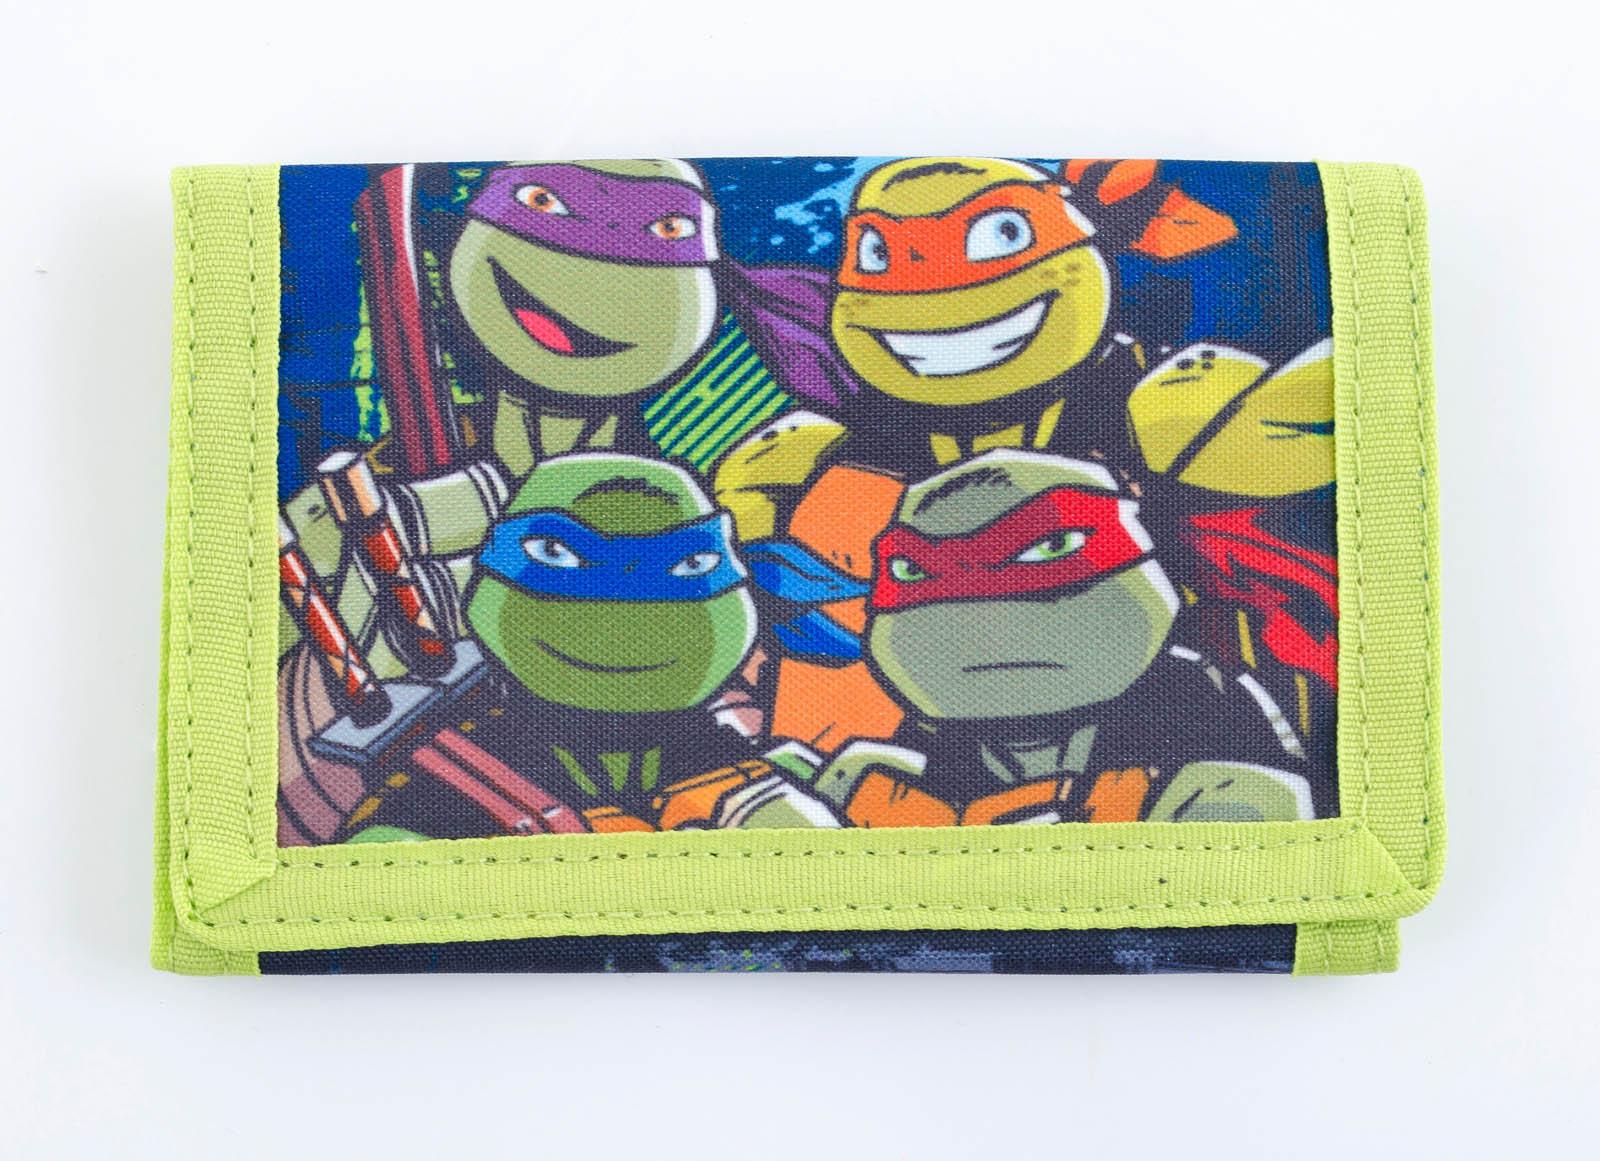 Кошелек Turtles, 24.5*12